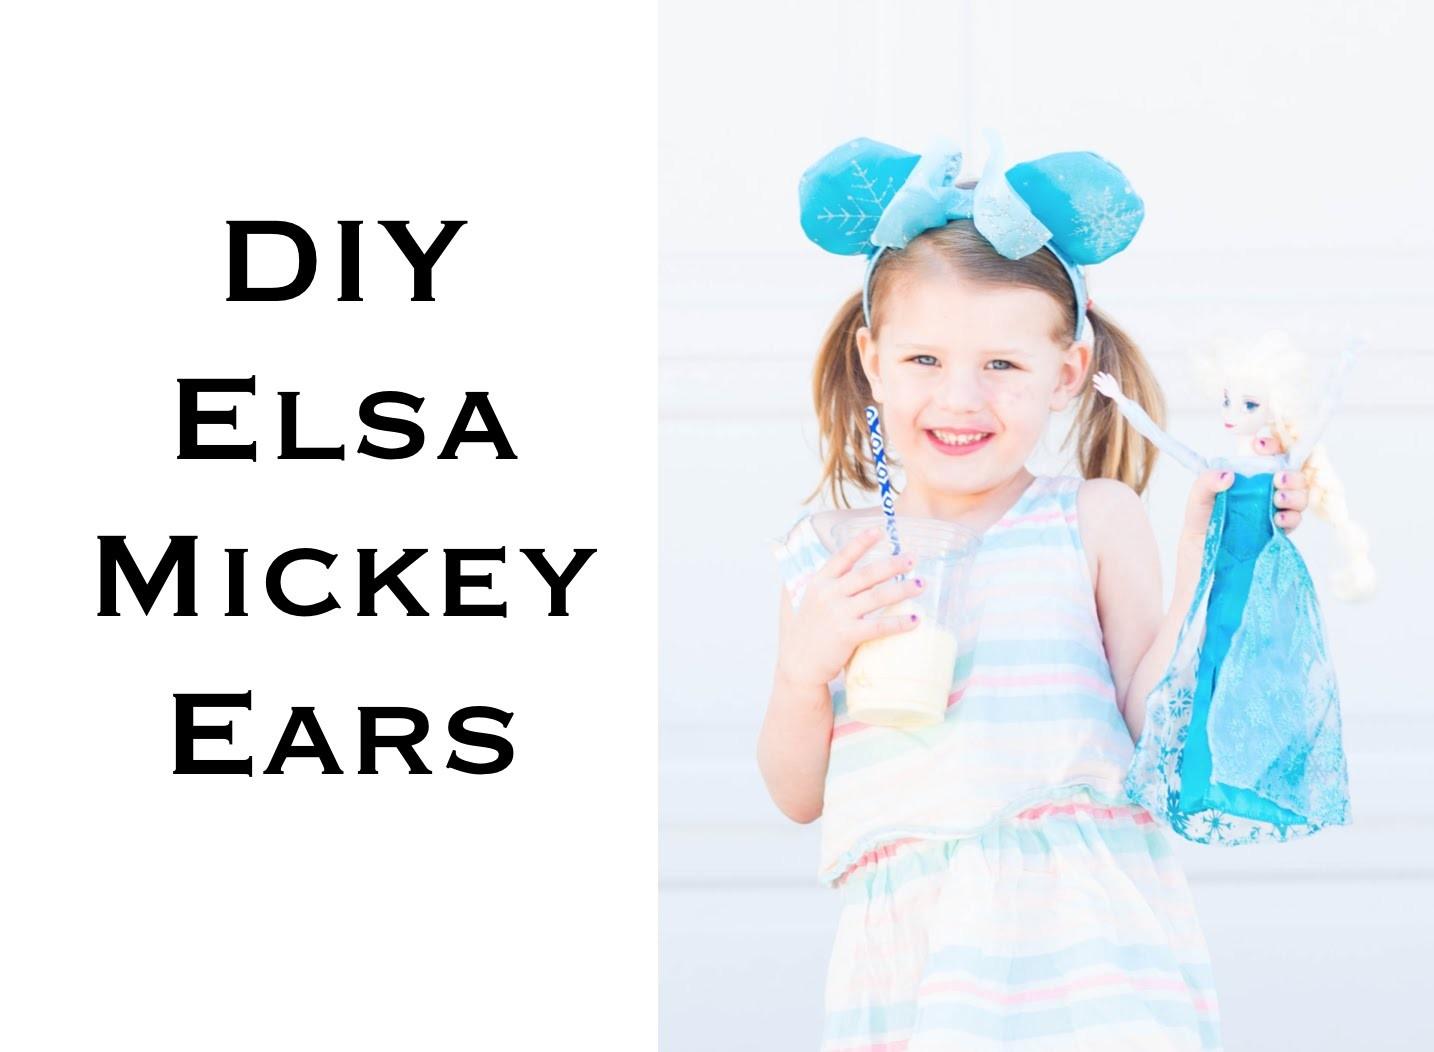 DIY Elsa Mickey Ears - Fast and Easy!